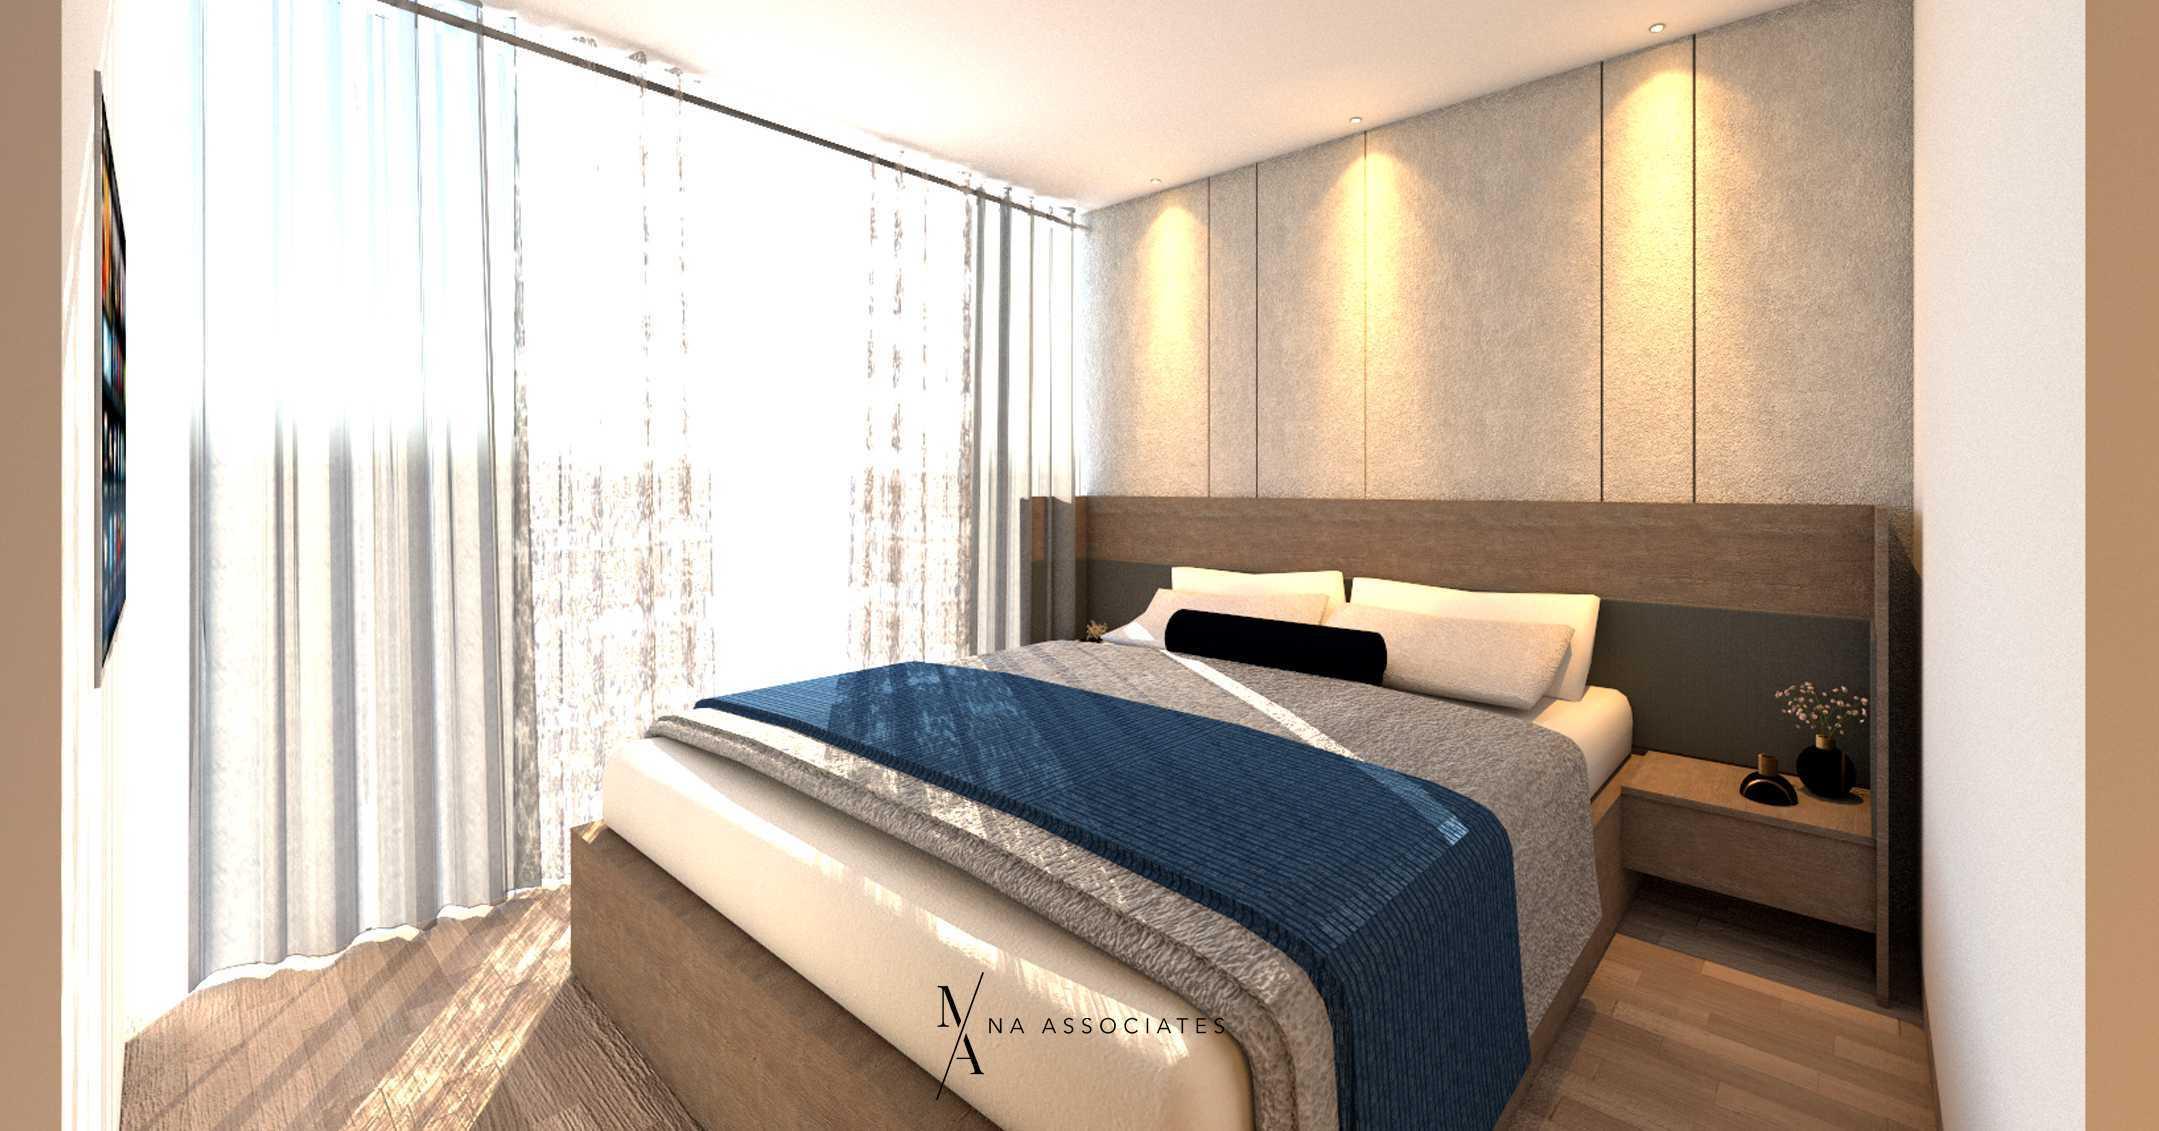 Na Associates Jgc House Jakarta, Daerah Khusus Ibukota Jakarta, Indonesia Jakarta, Daerah Khusus Ibukota Jakarta, Indonesia Master Bedroom Contemporary 75116